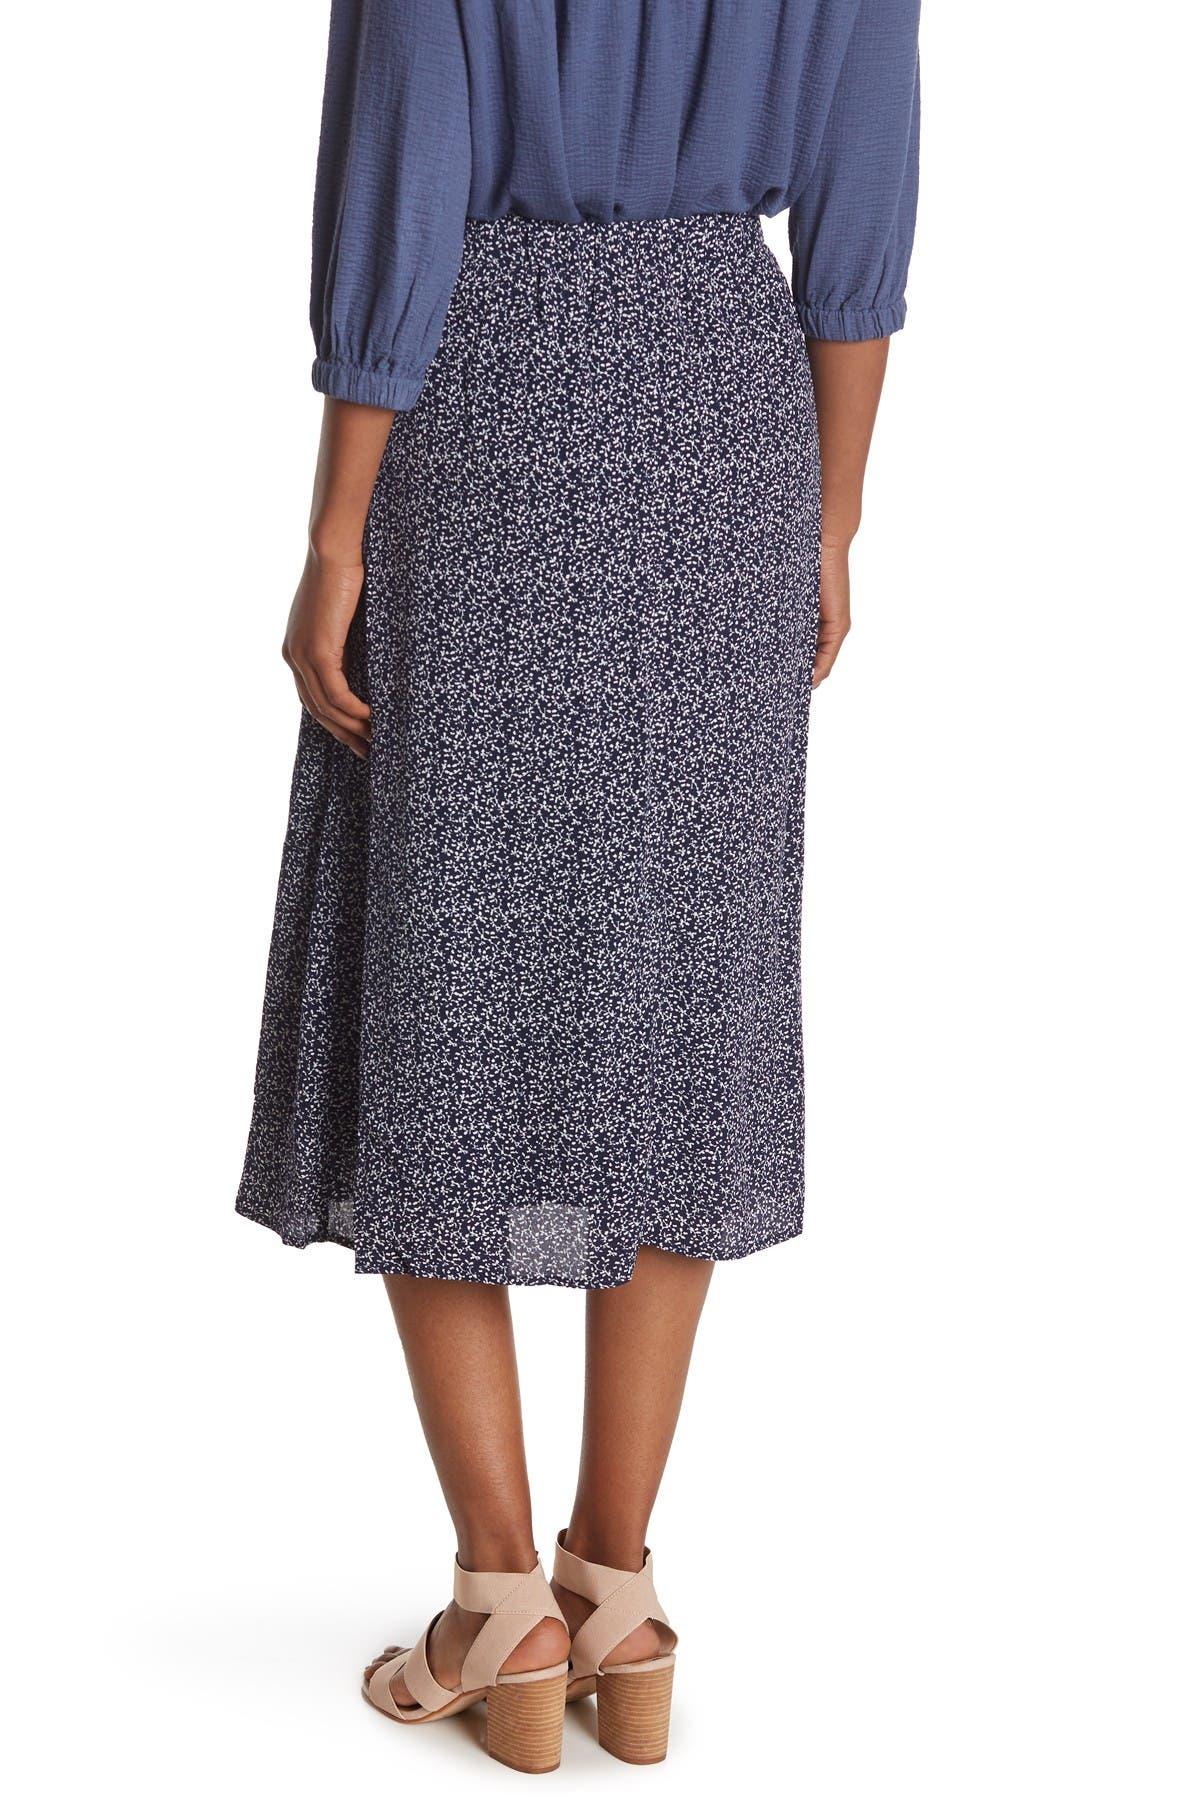 Melloday Ditsy Print Midi Skirt In Neutrals